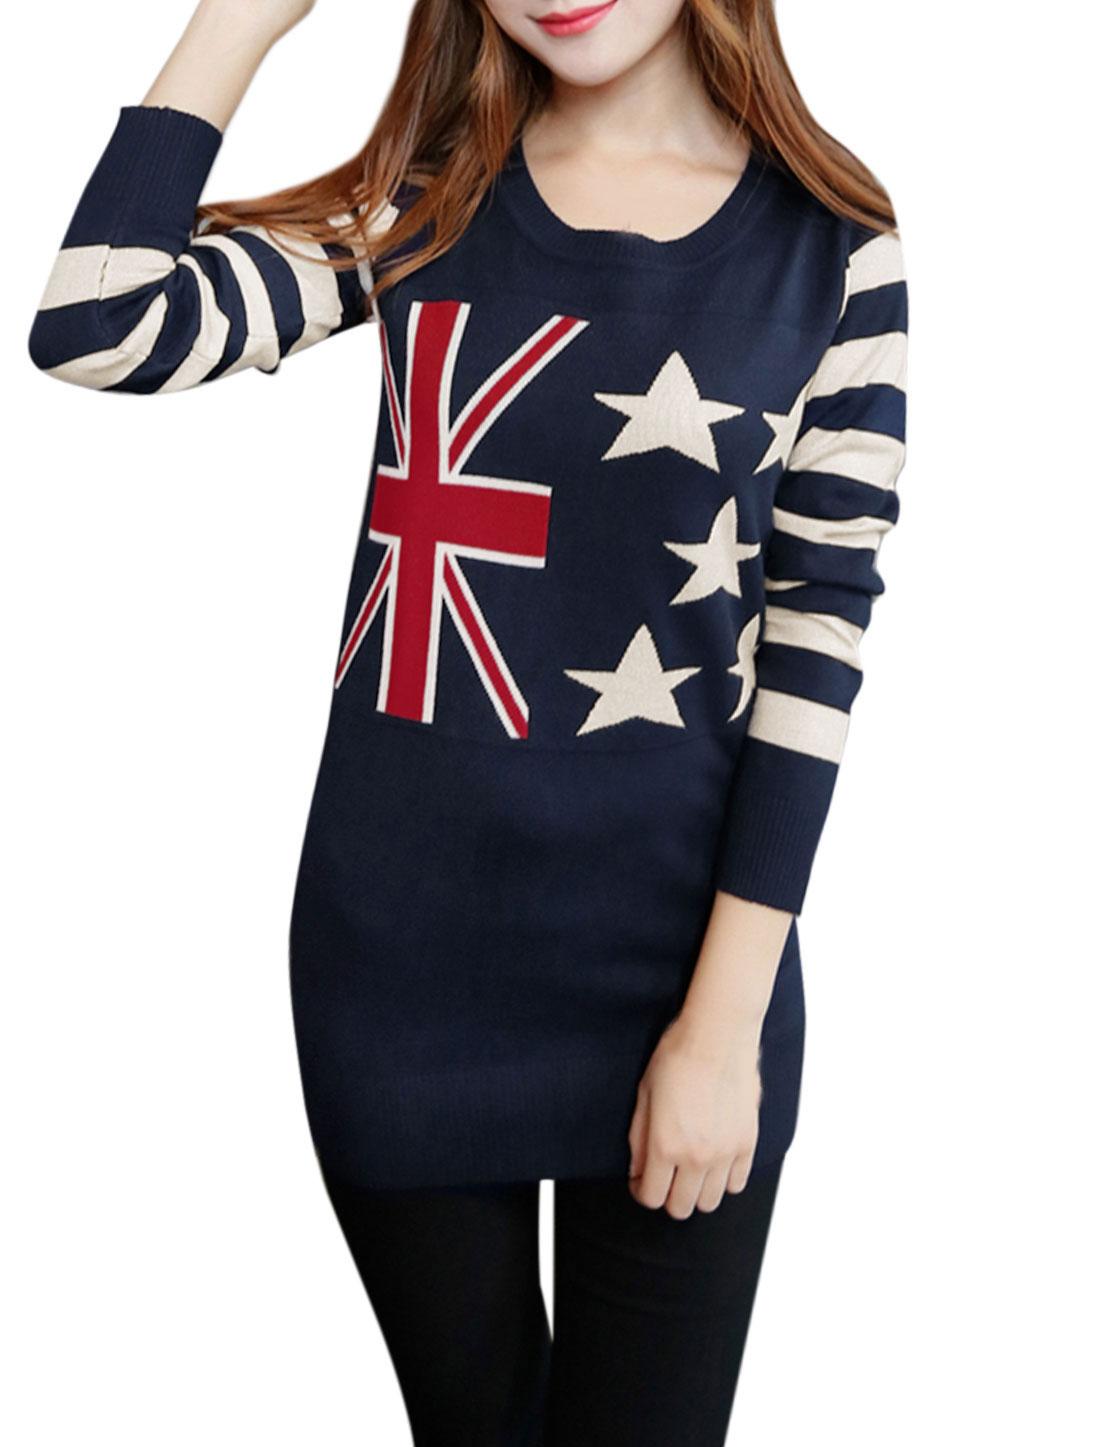 Woman Stripes Stars Union Jack Flag Pattern Tunic Knit Shirt Navy Blue XS